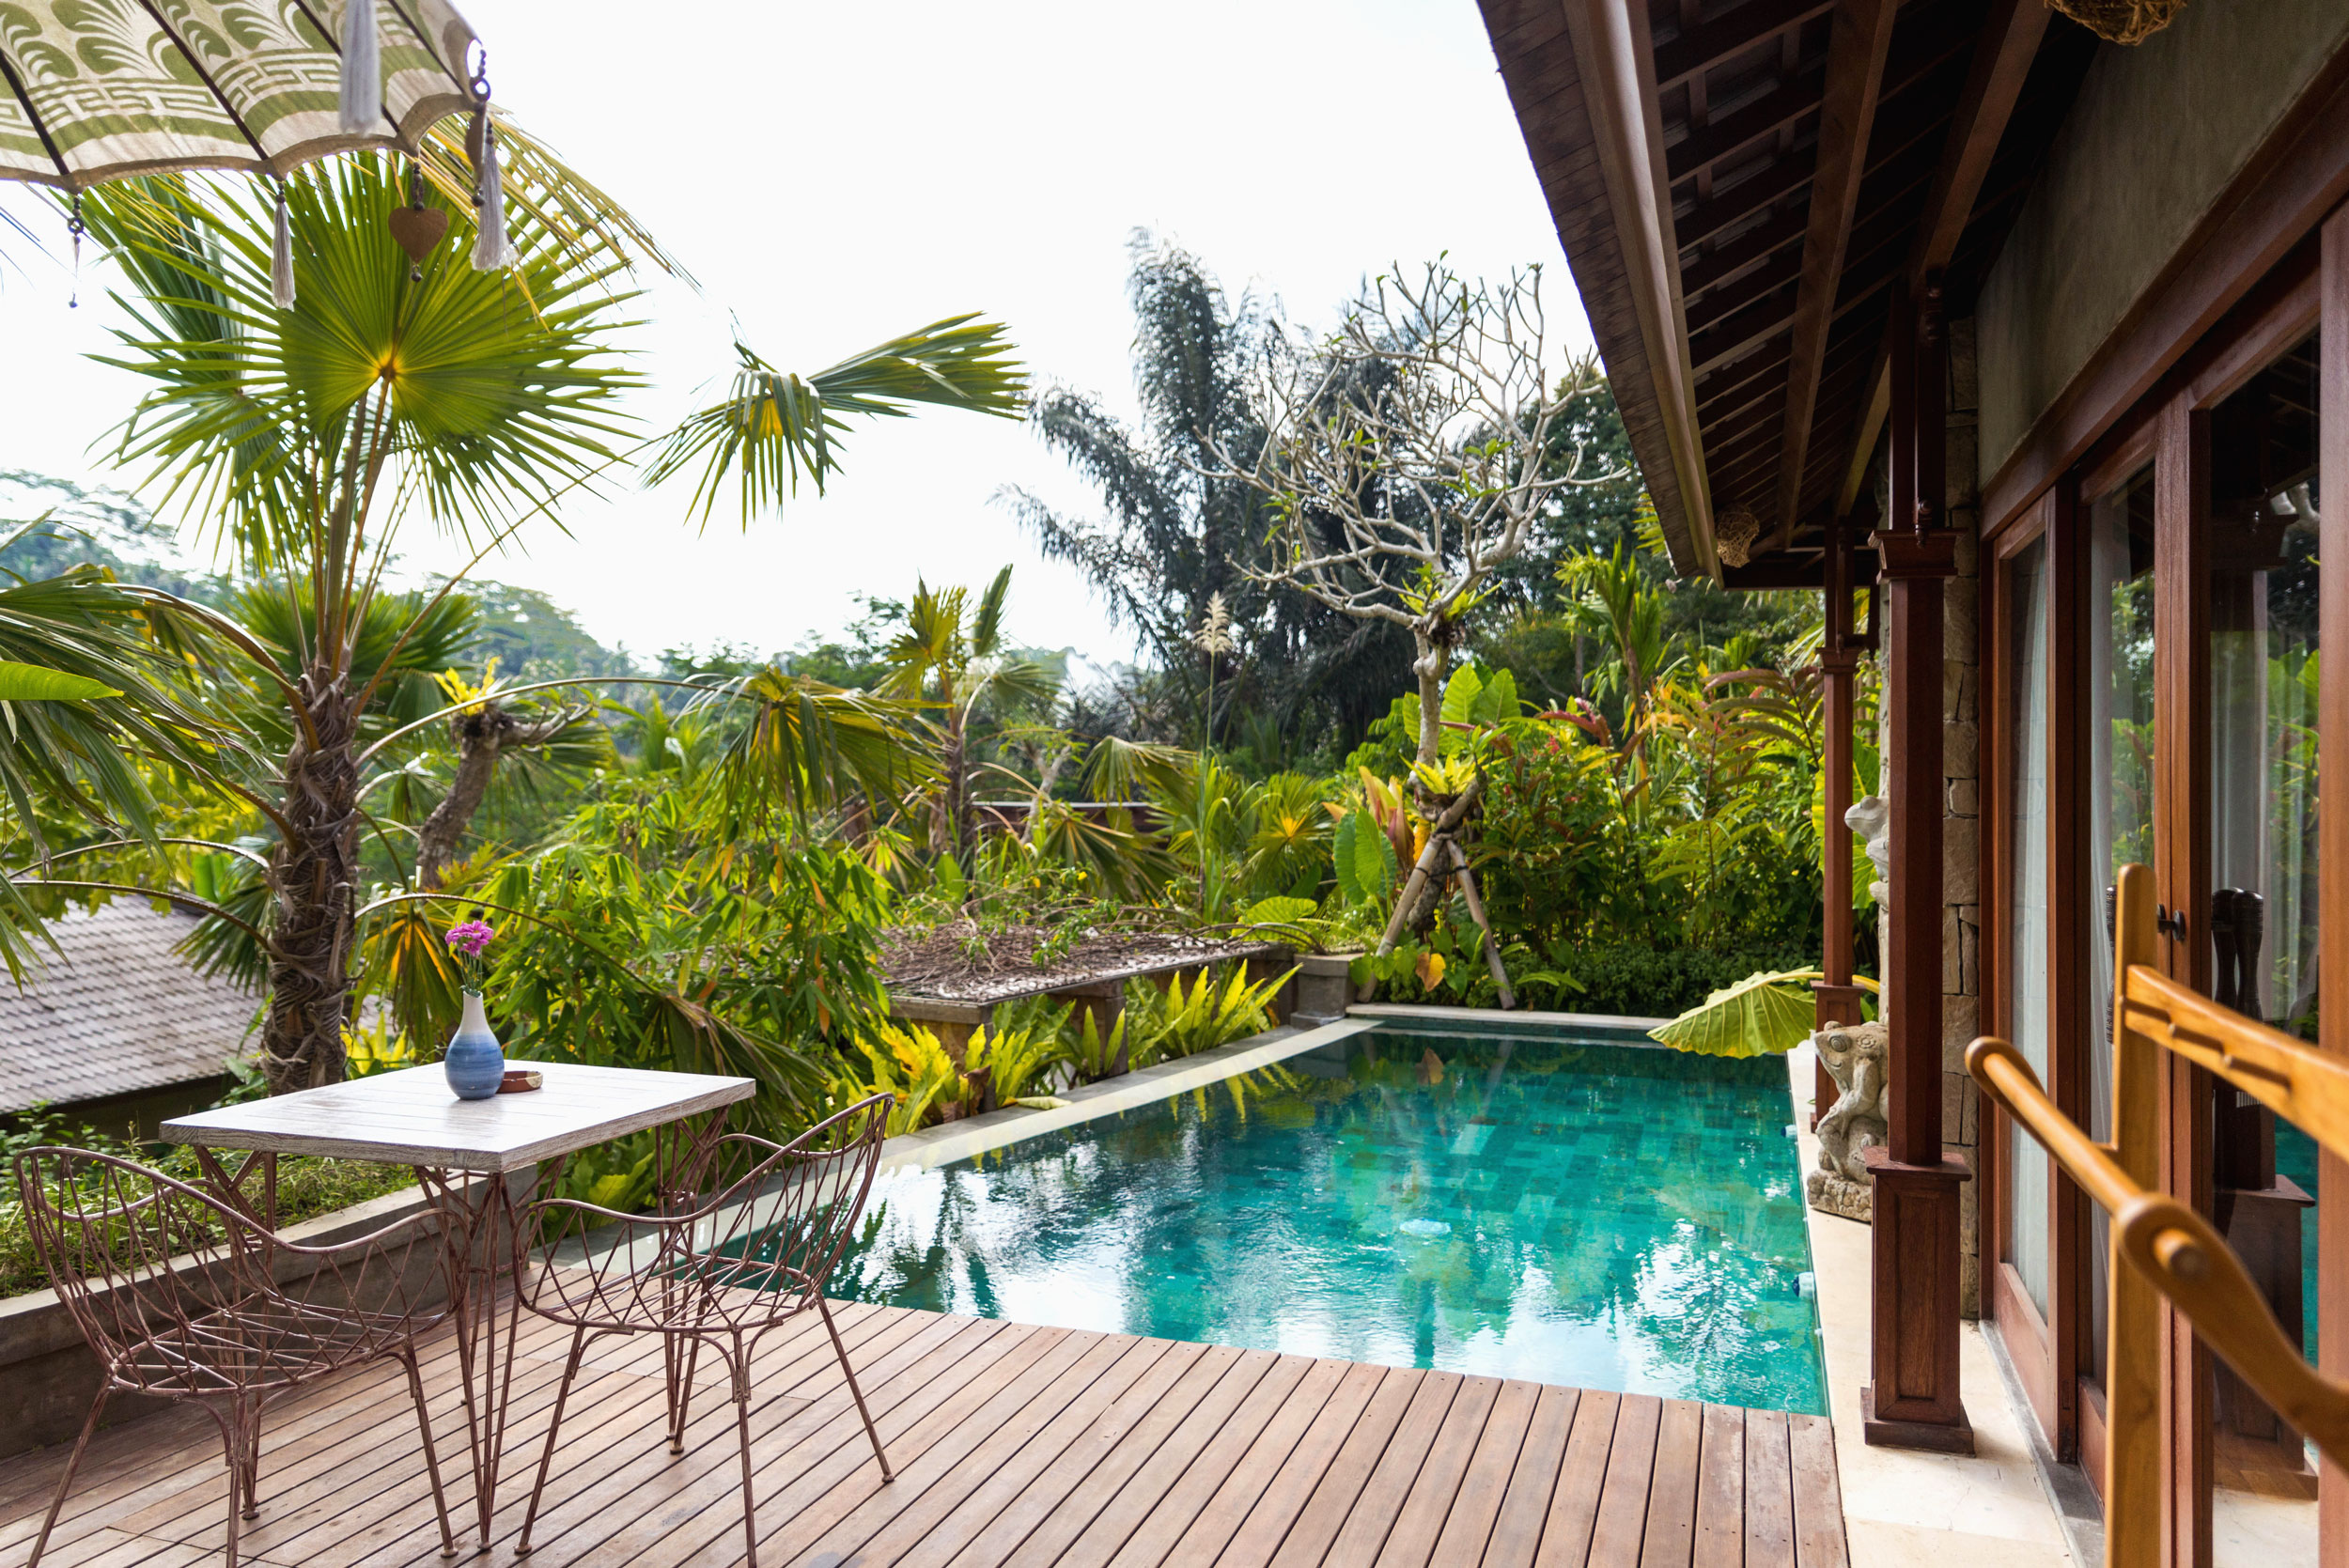 Private pool at Nau Villas, Ubud in Bali